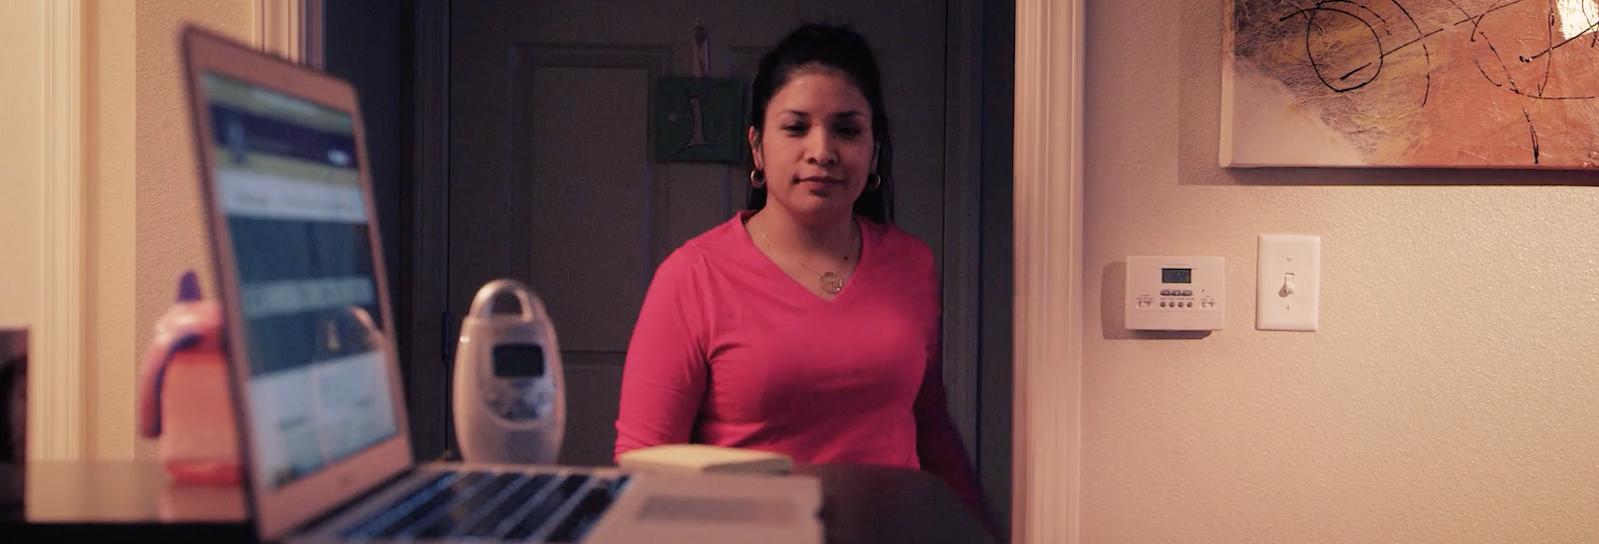 Woman walks from dim hallway toward her laptop.